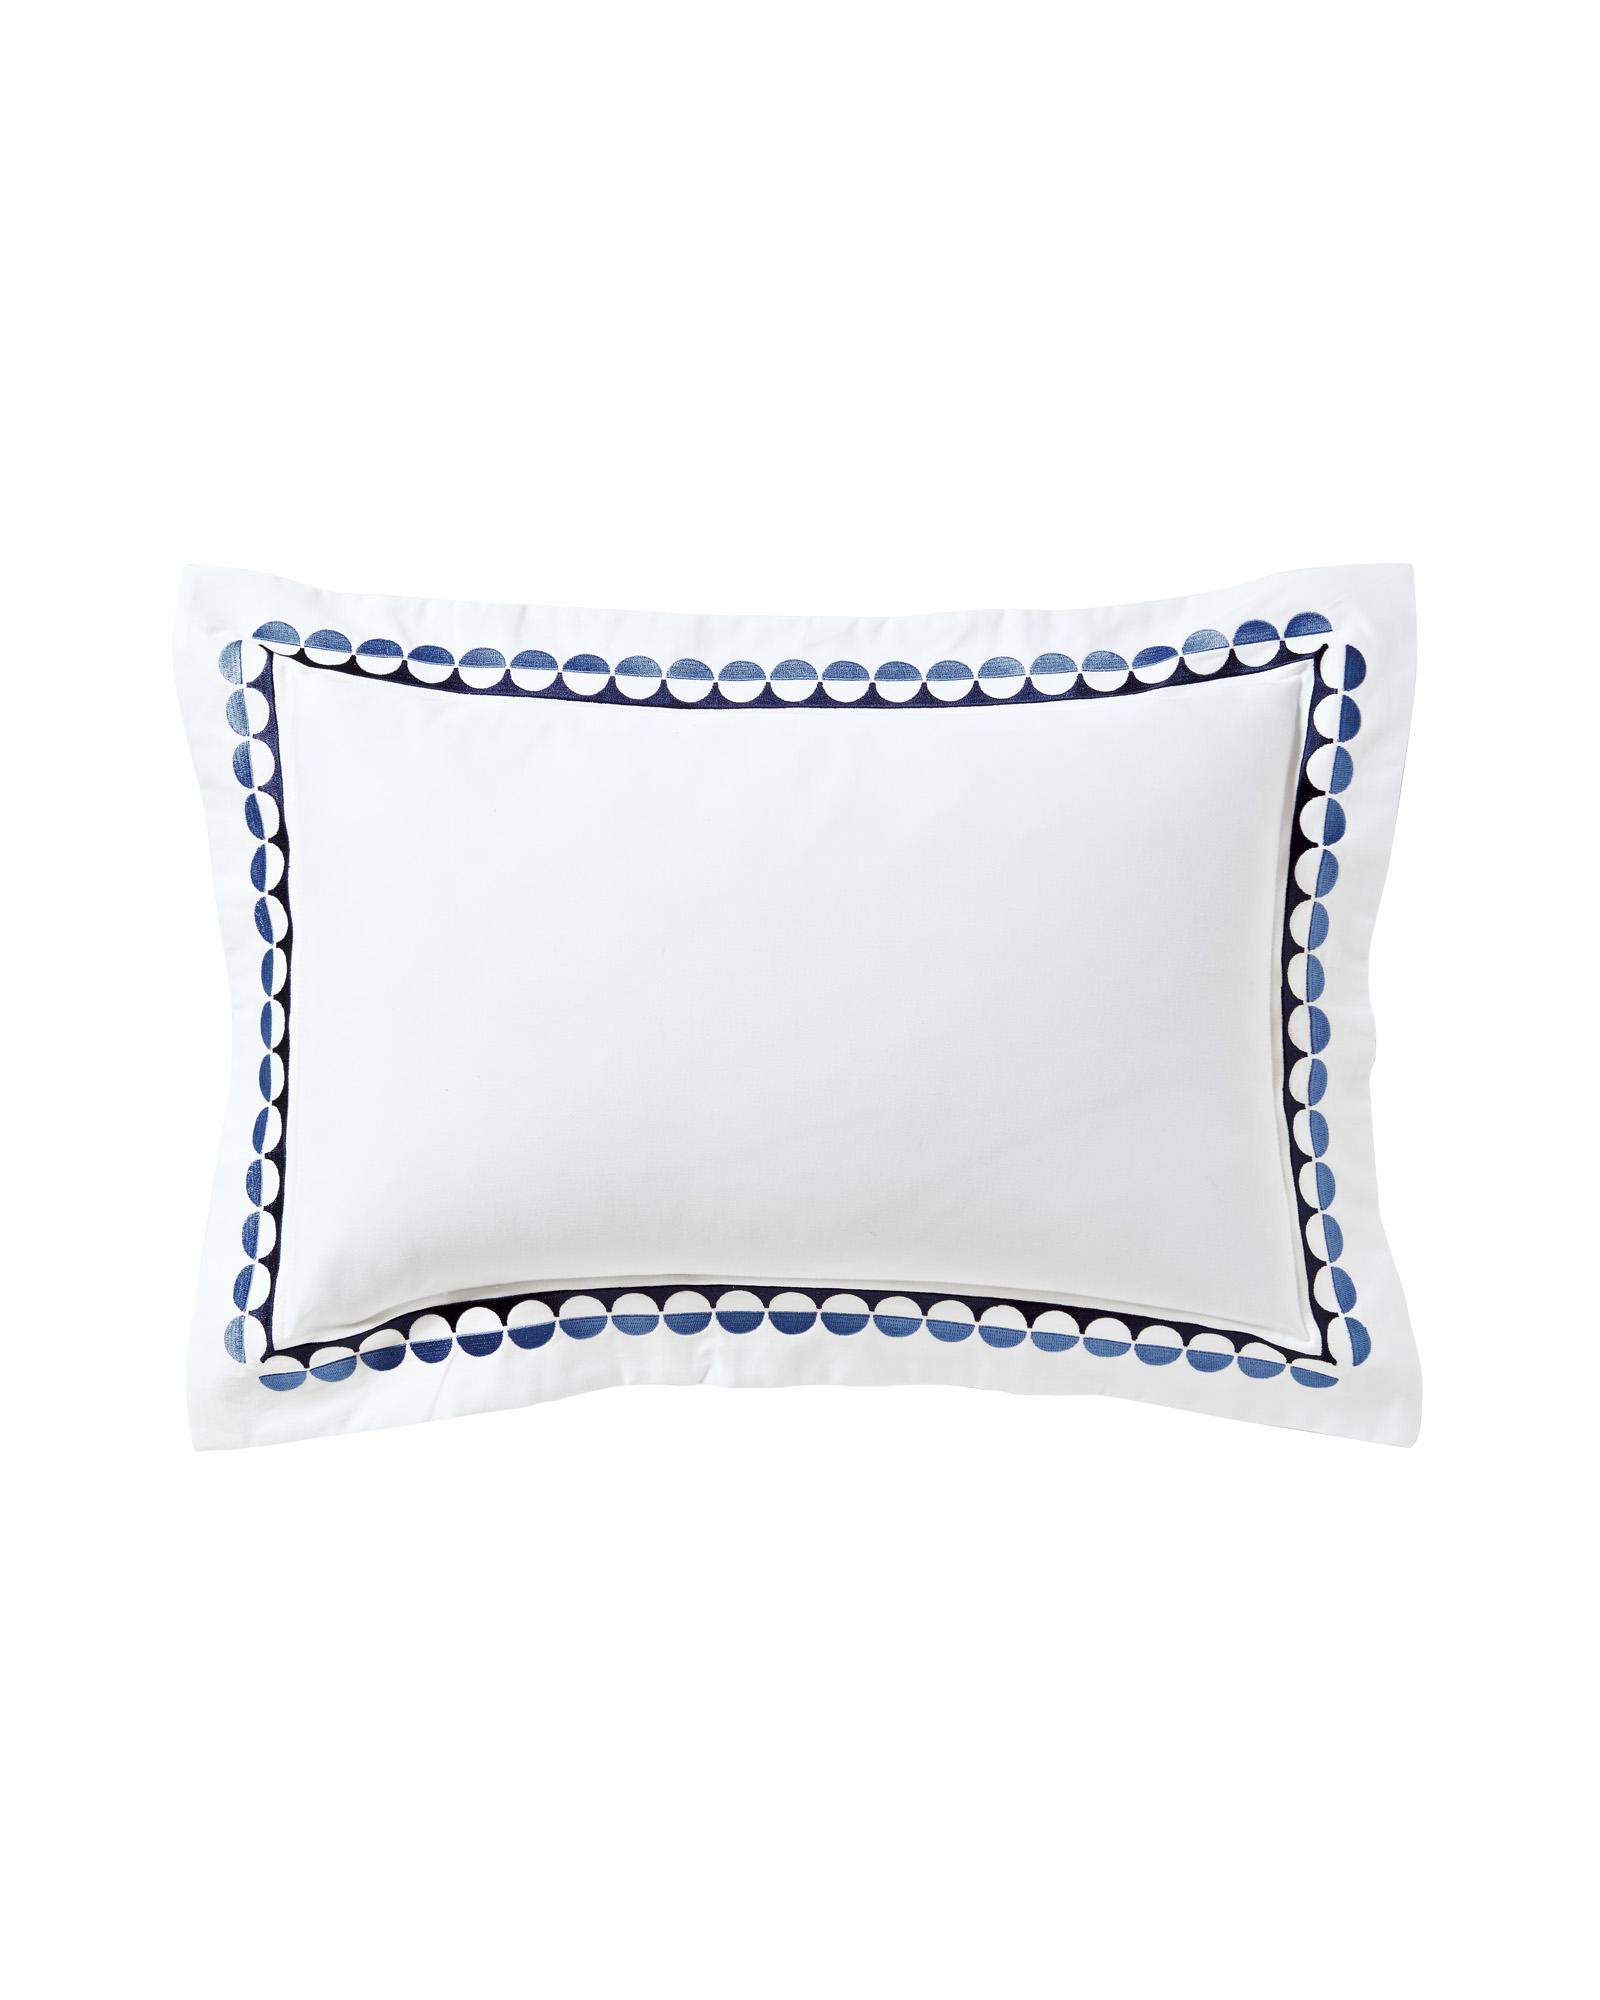 Boudoir_Pillow_Oceanside_Embroidered_12x18_Blue_MV_0280_Crop_BASE.jpg